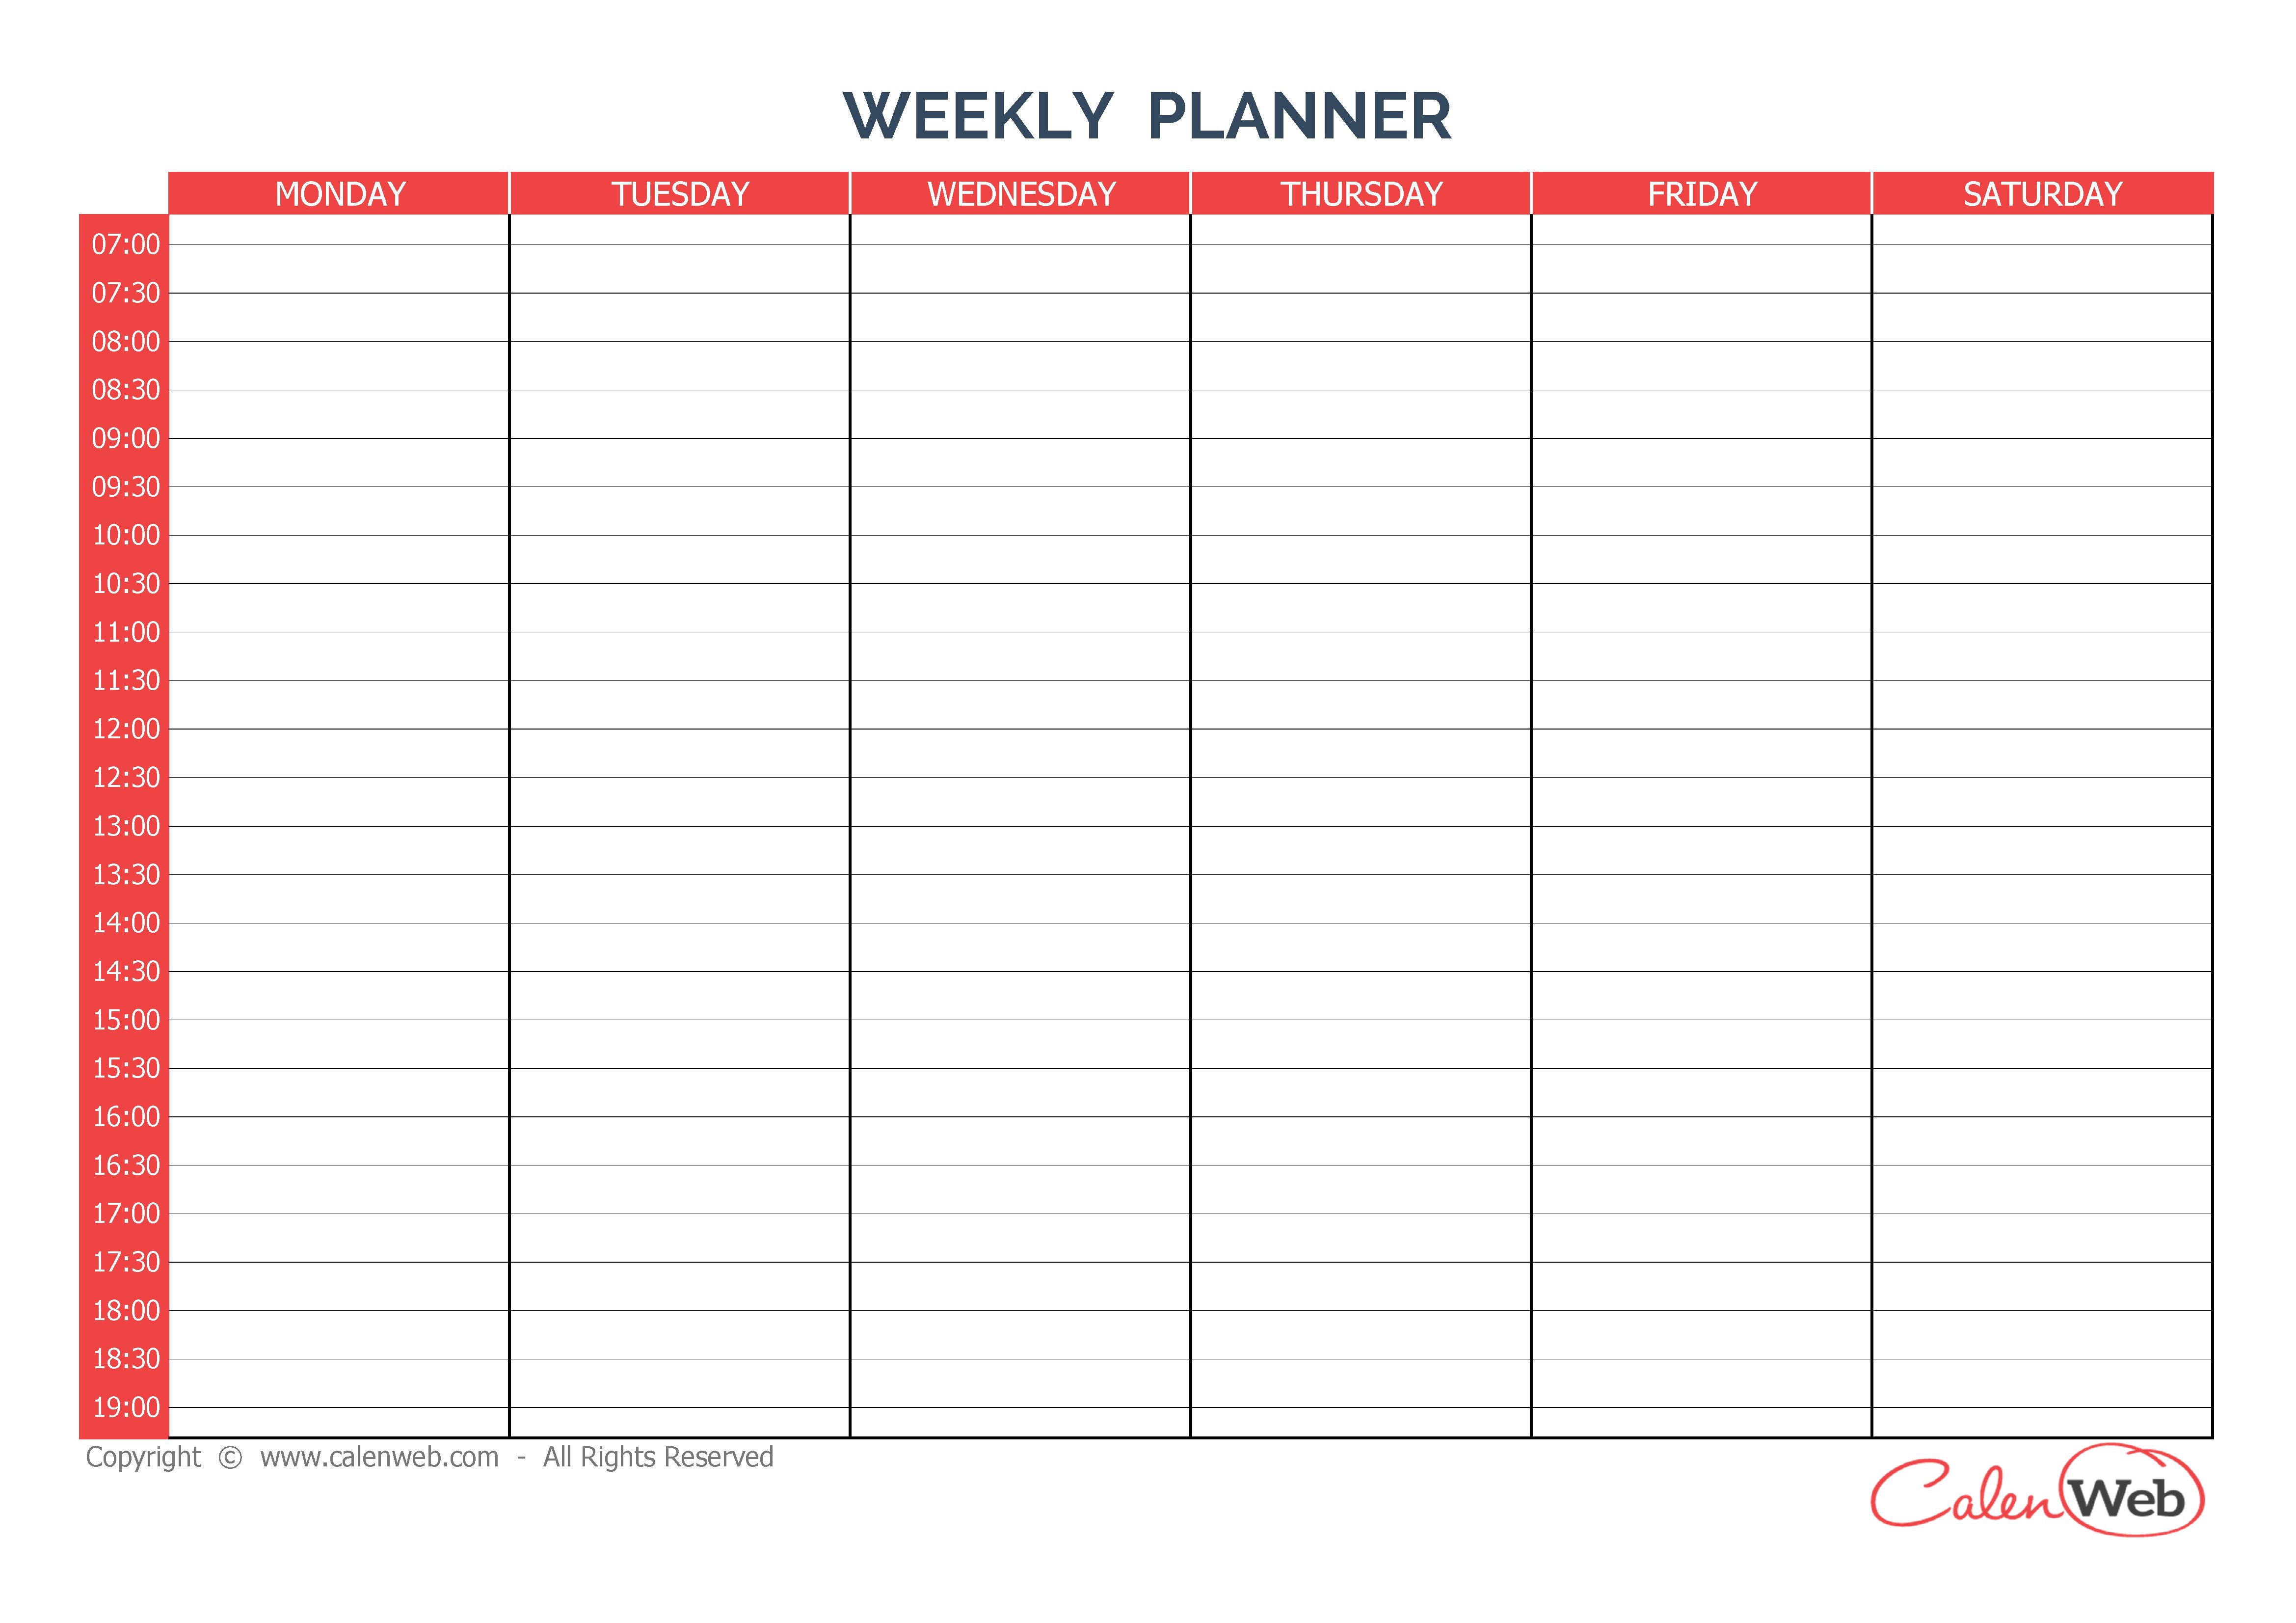 Weekly Planner 6 Days A Week Of 6 Days - Calenweb inside 7 Day Week Calendar Template